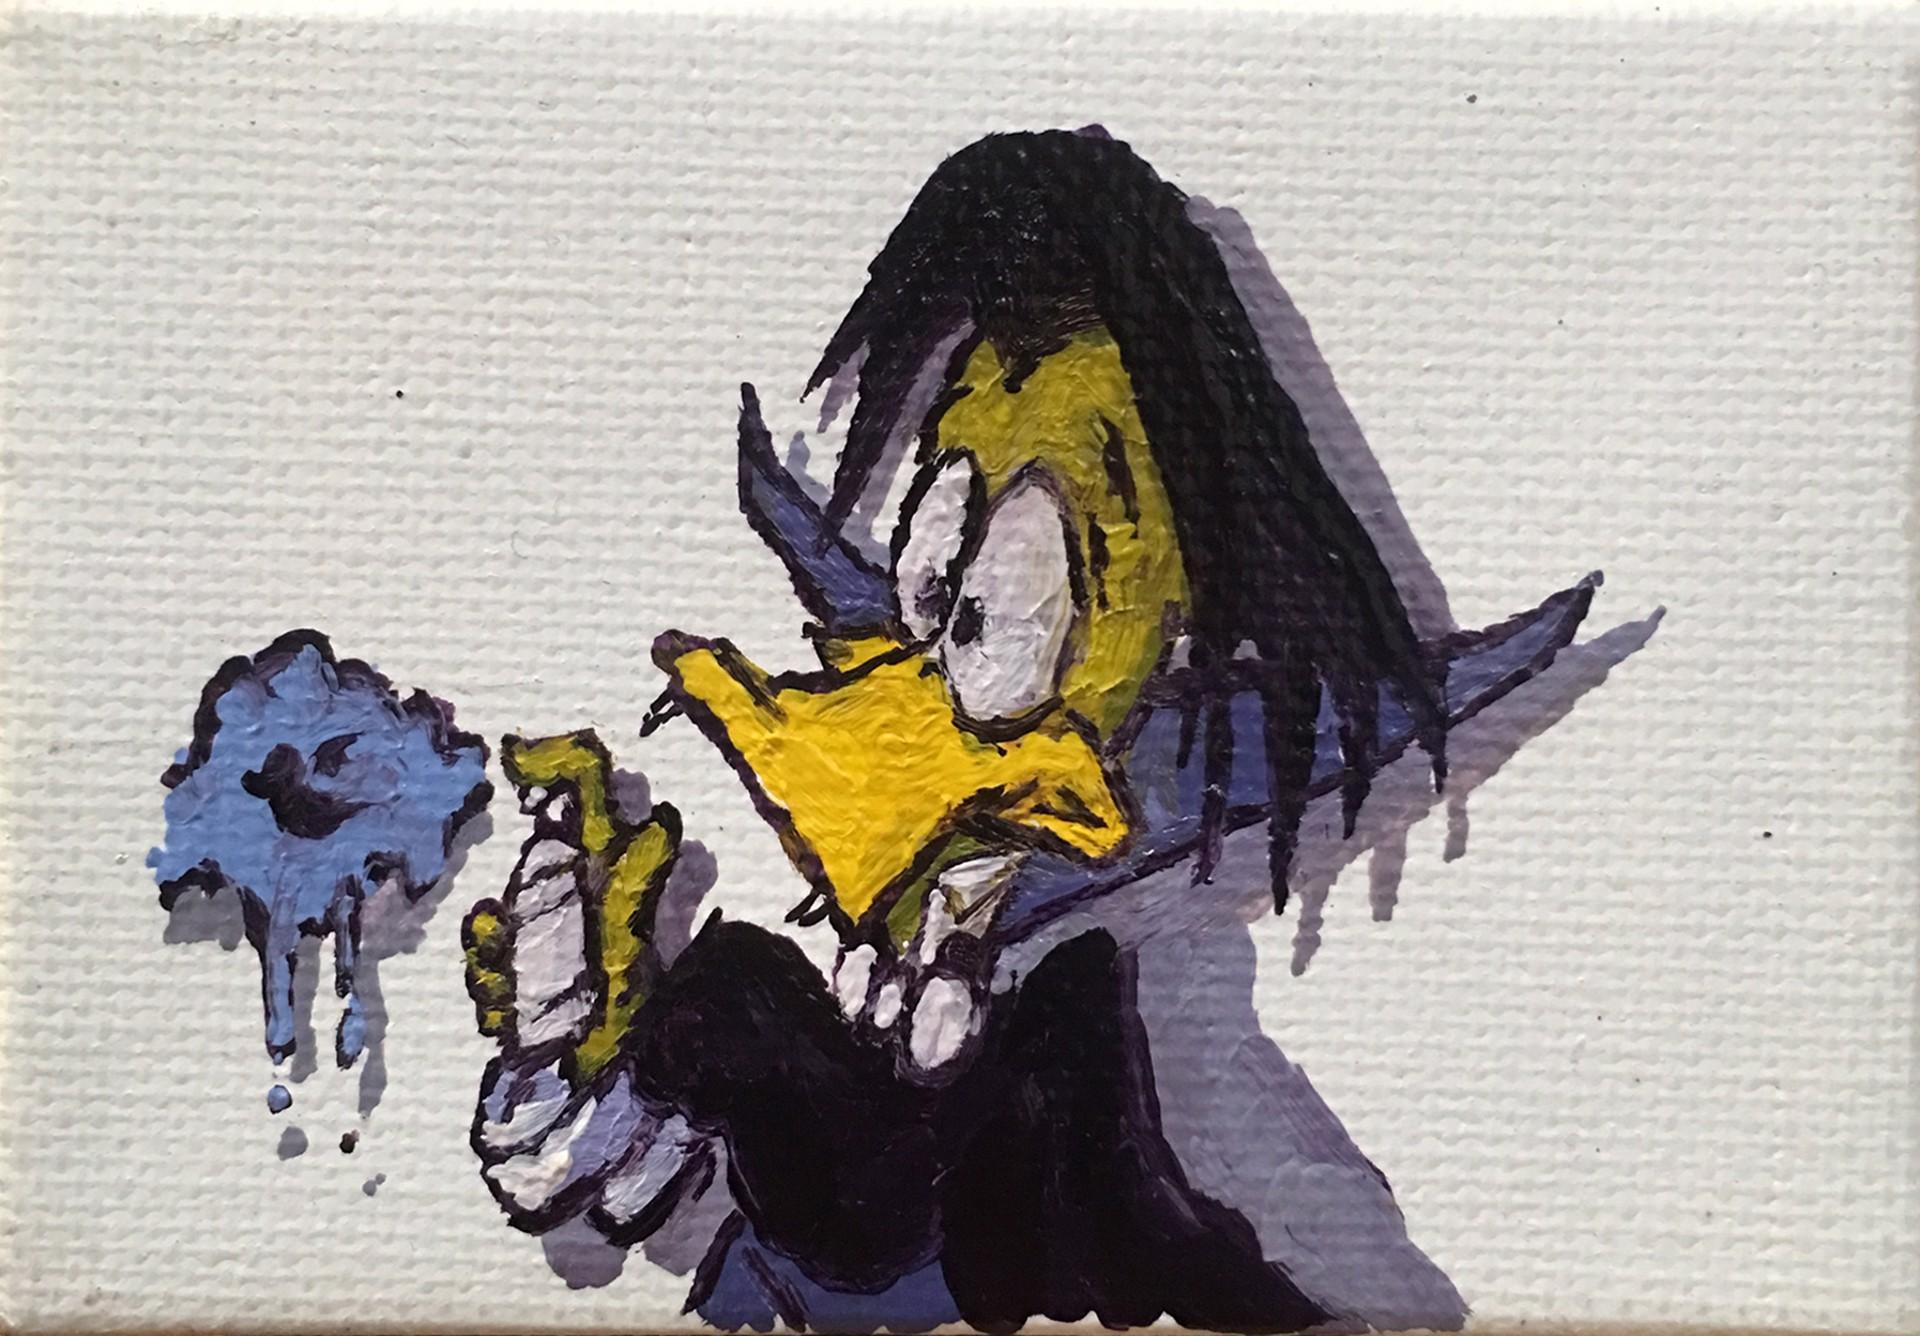 Count Duckula by Delton Demarest